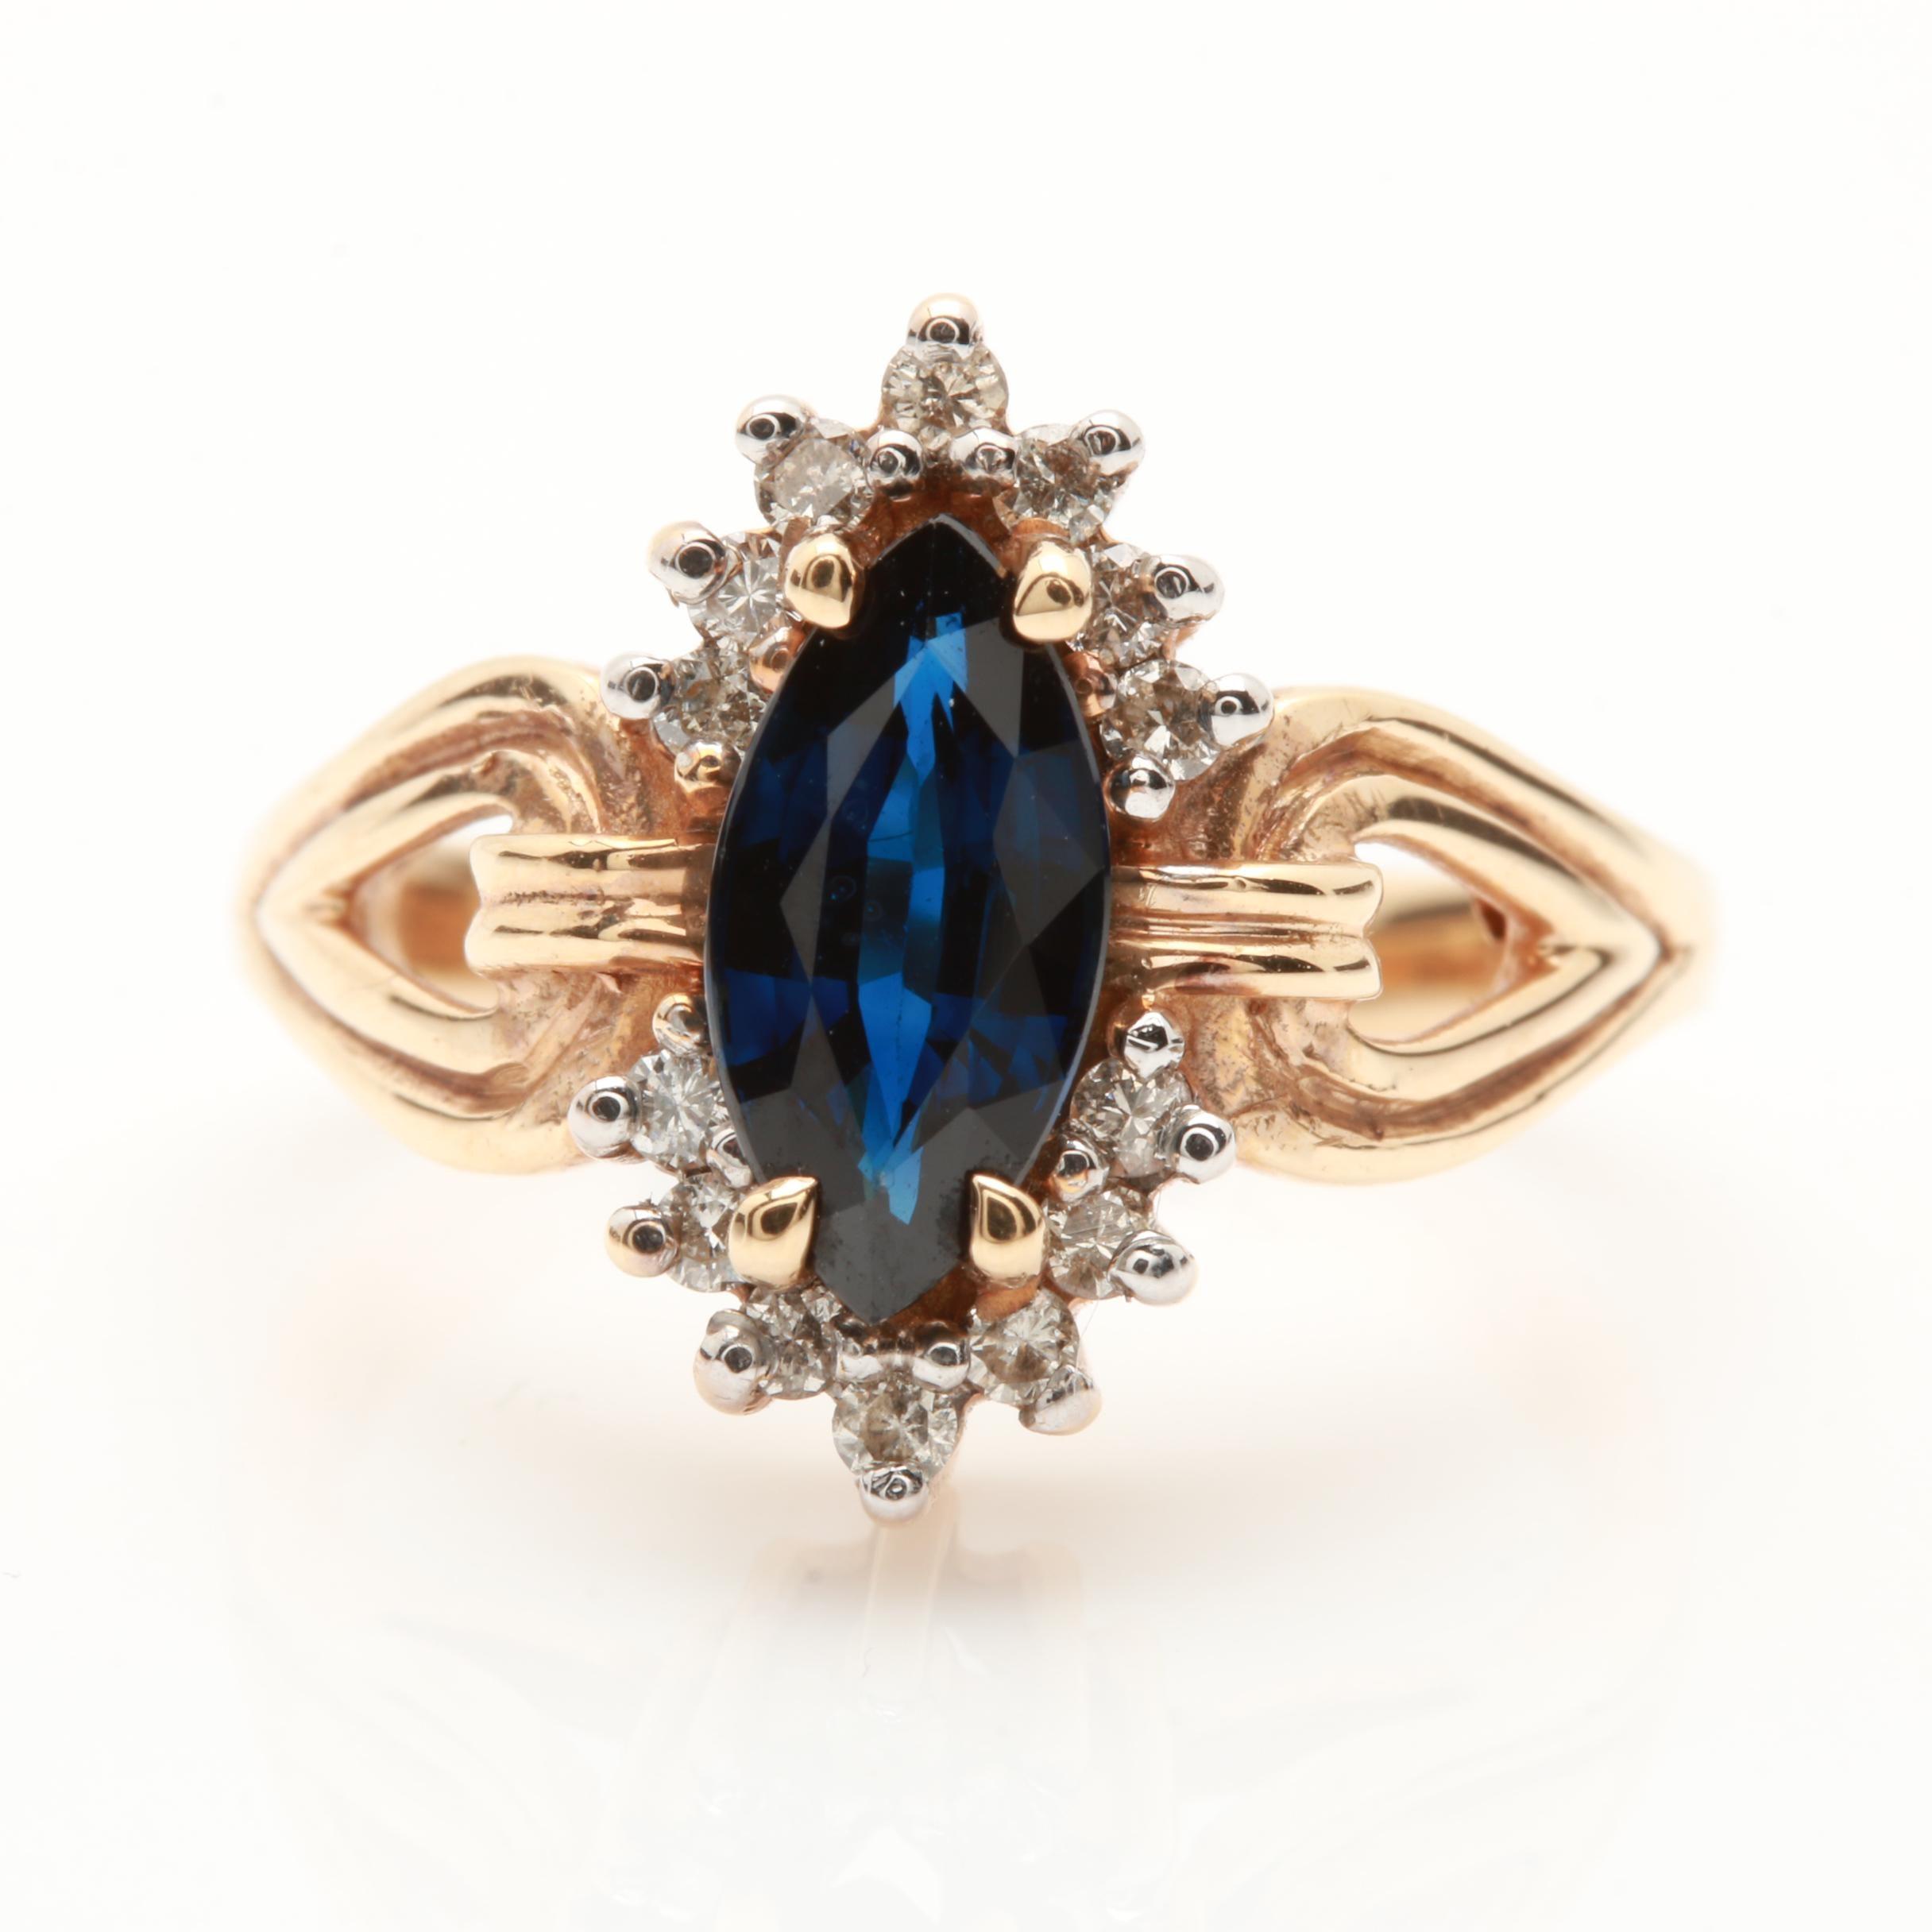 14K Yellow Gold 1.25 CT Sapphire and Diamond Ring